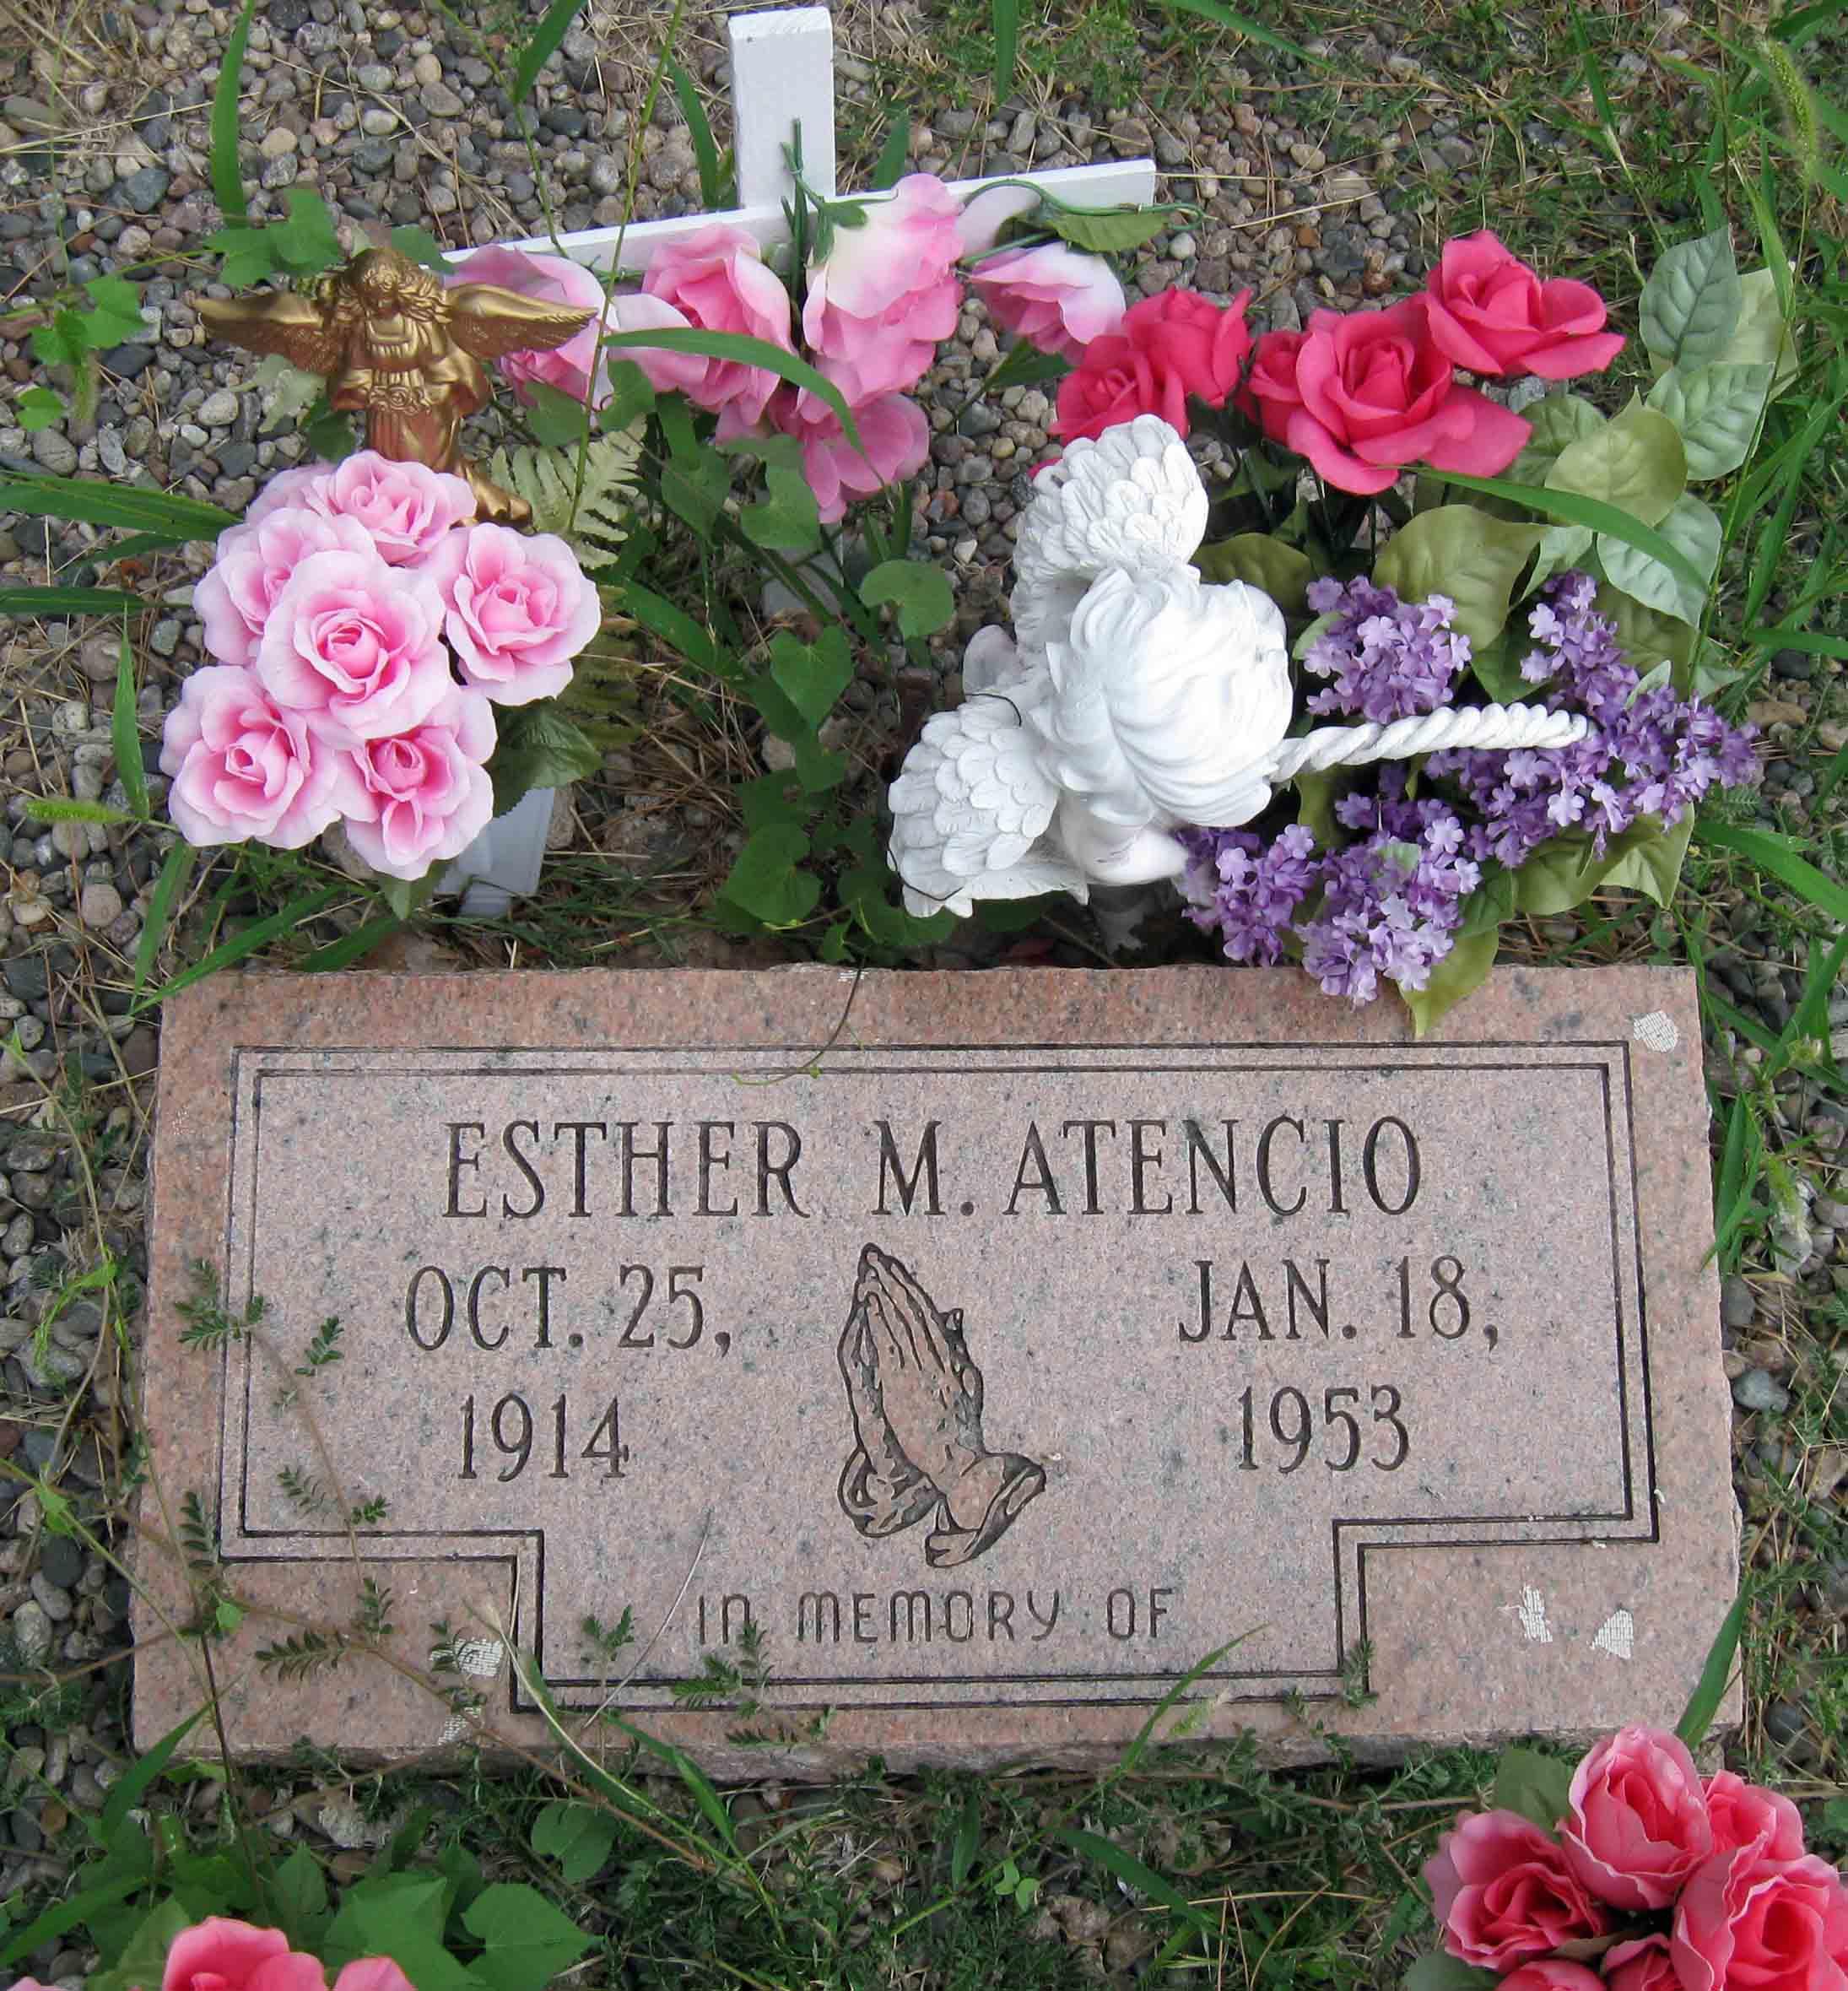 Esther M. Atencio